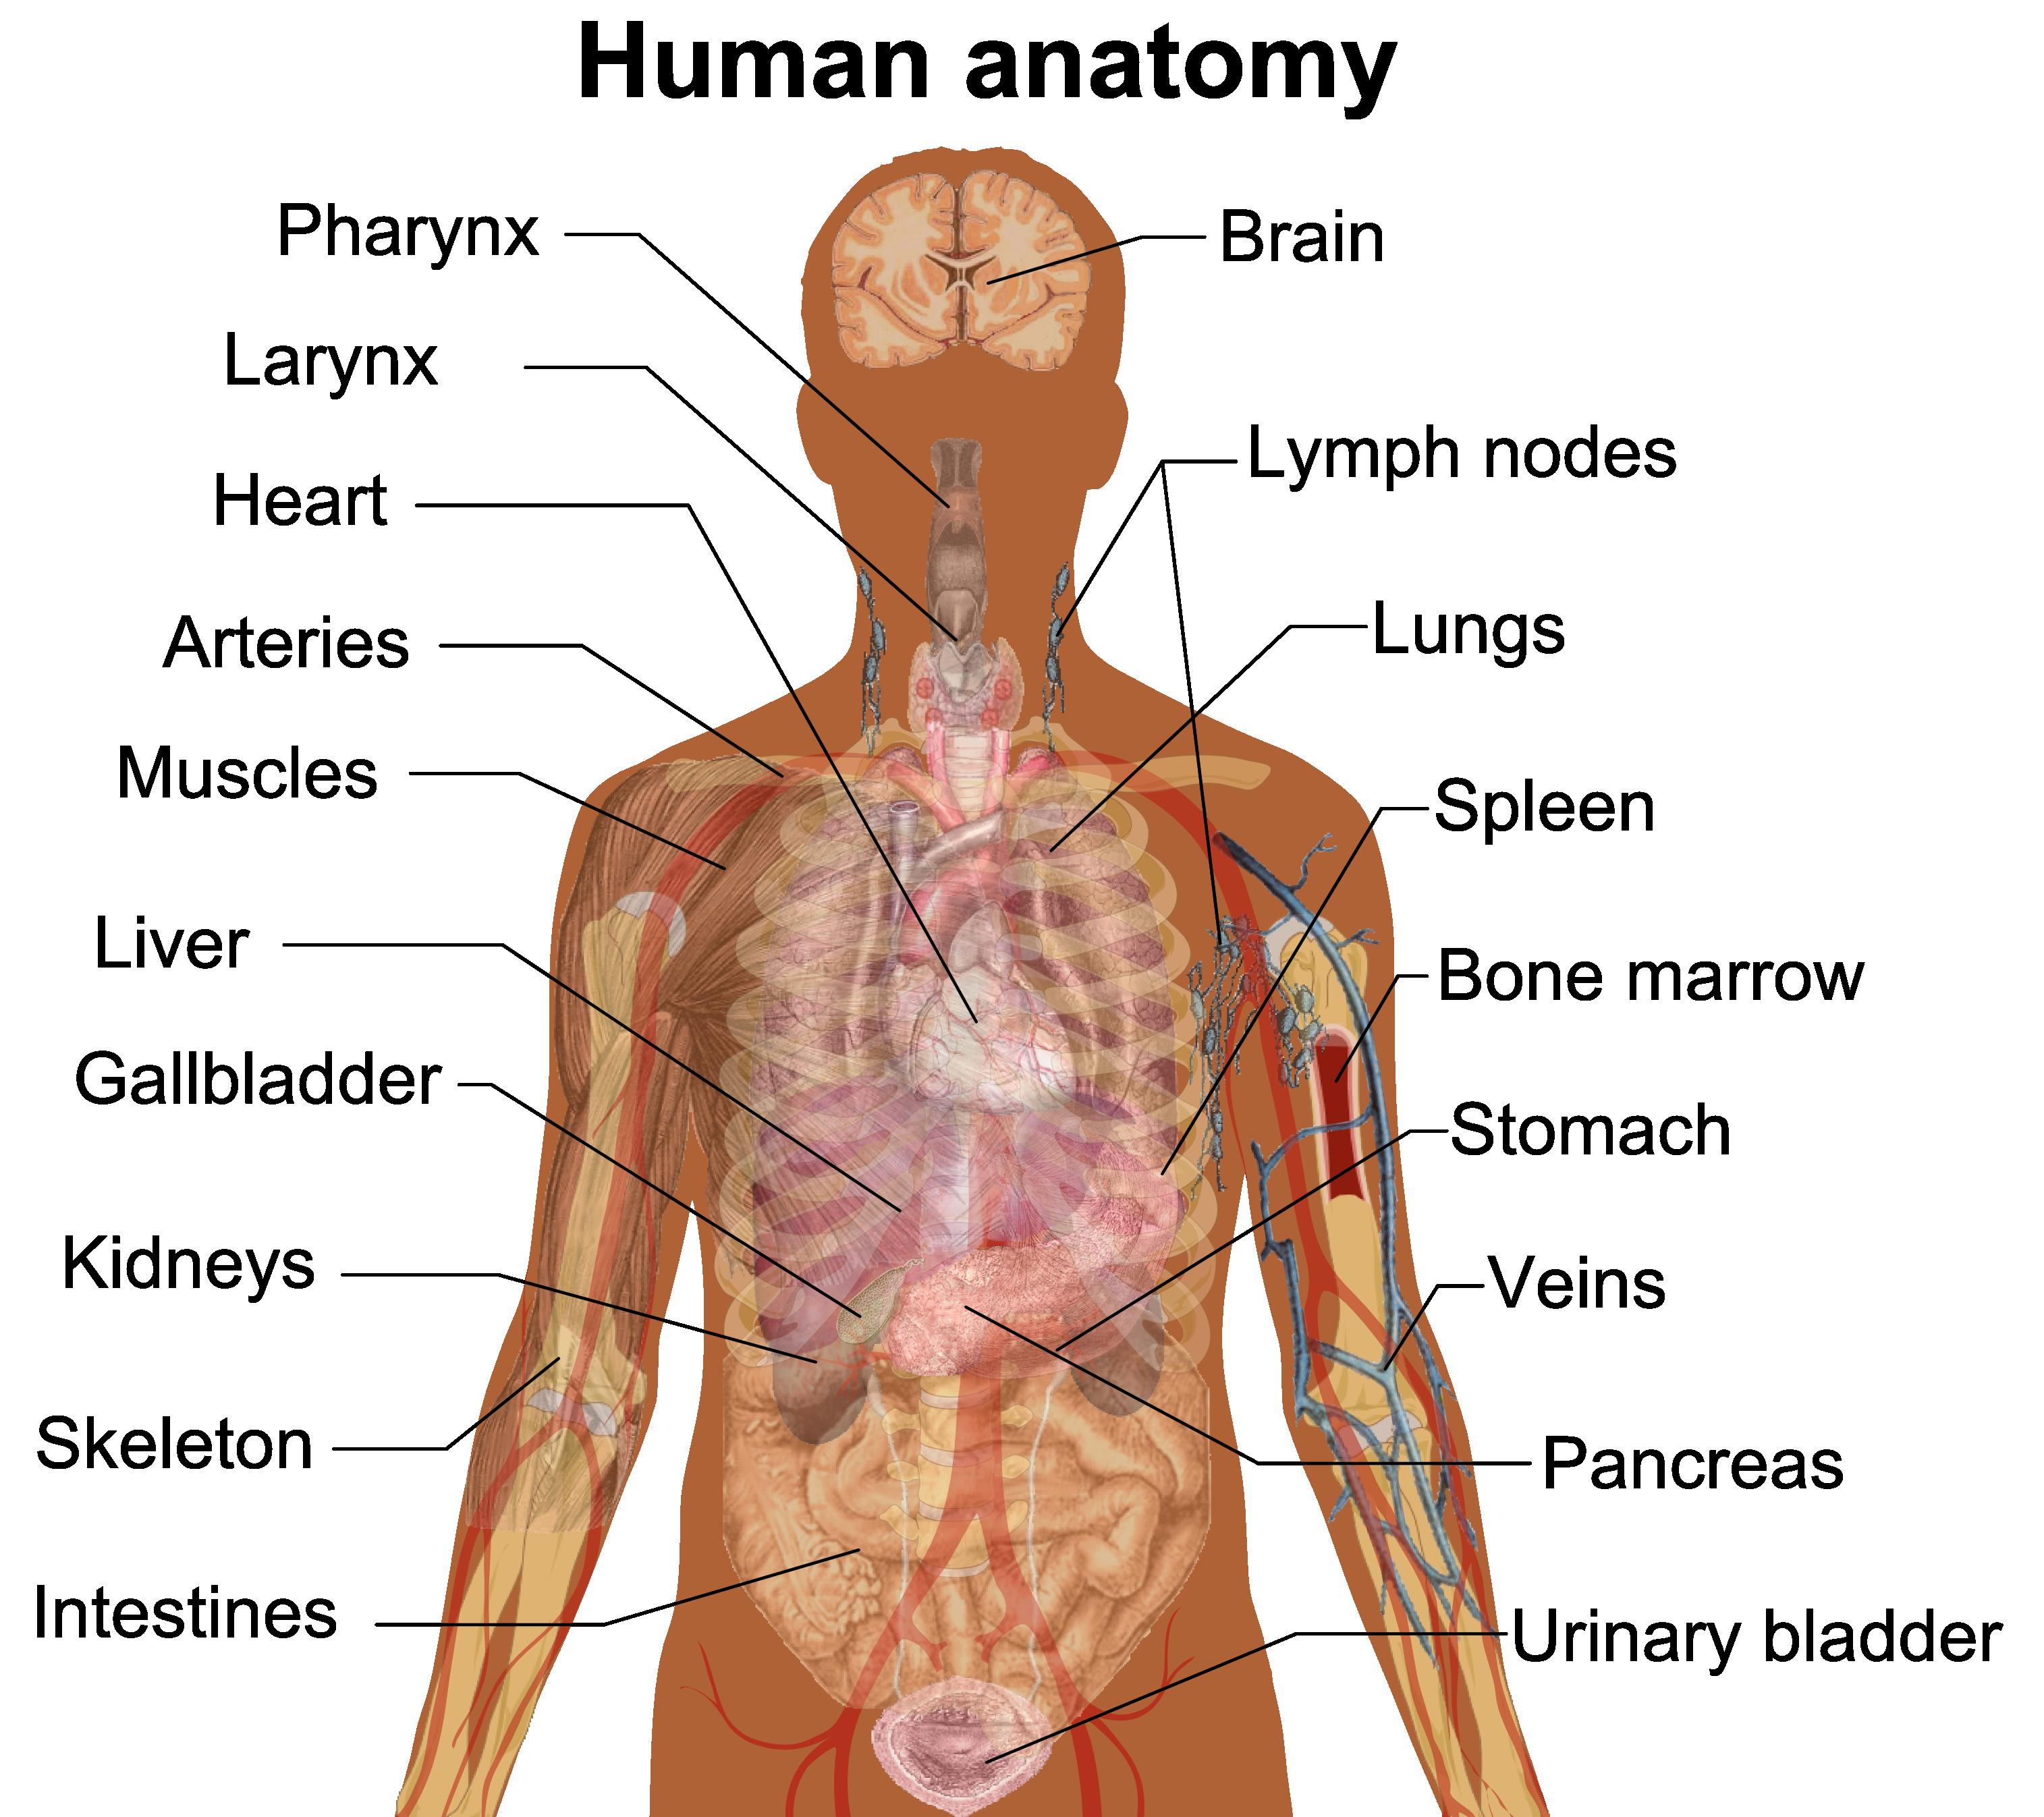 Human anatomy internal organs diagram